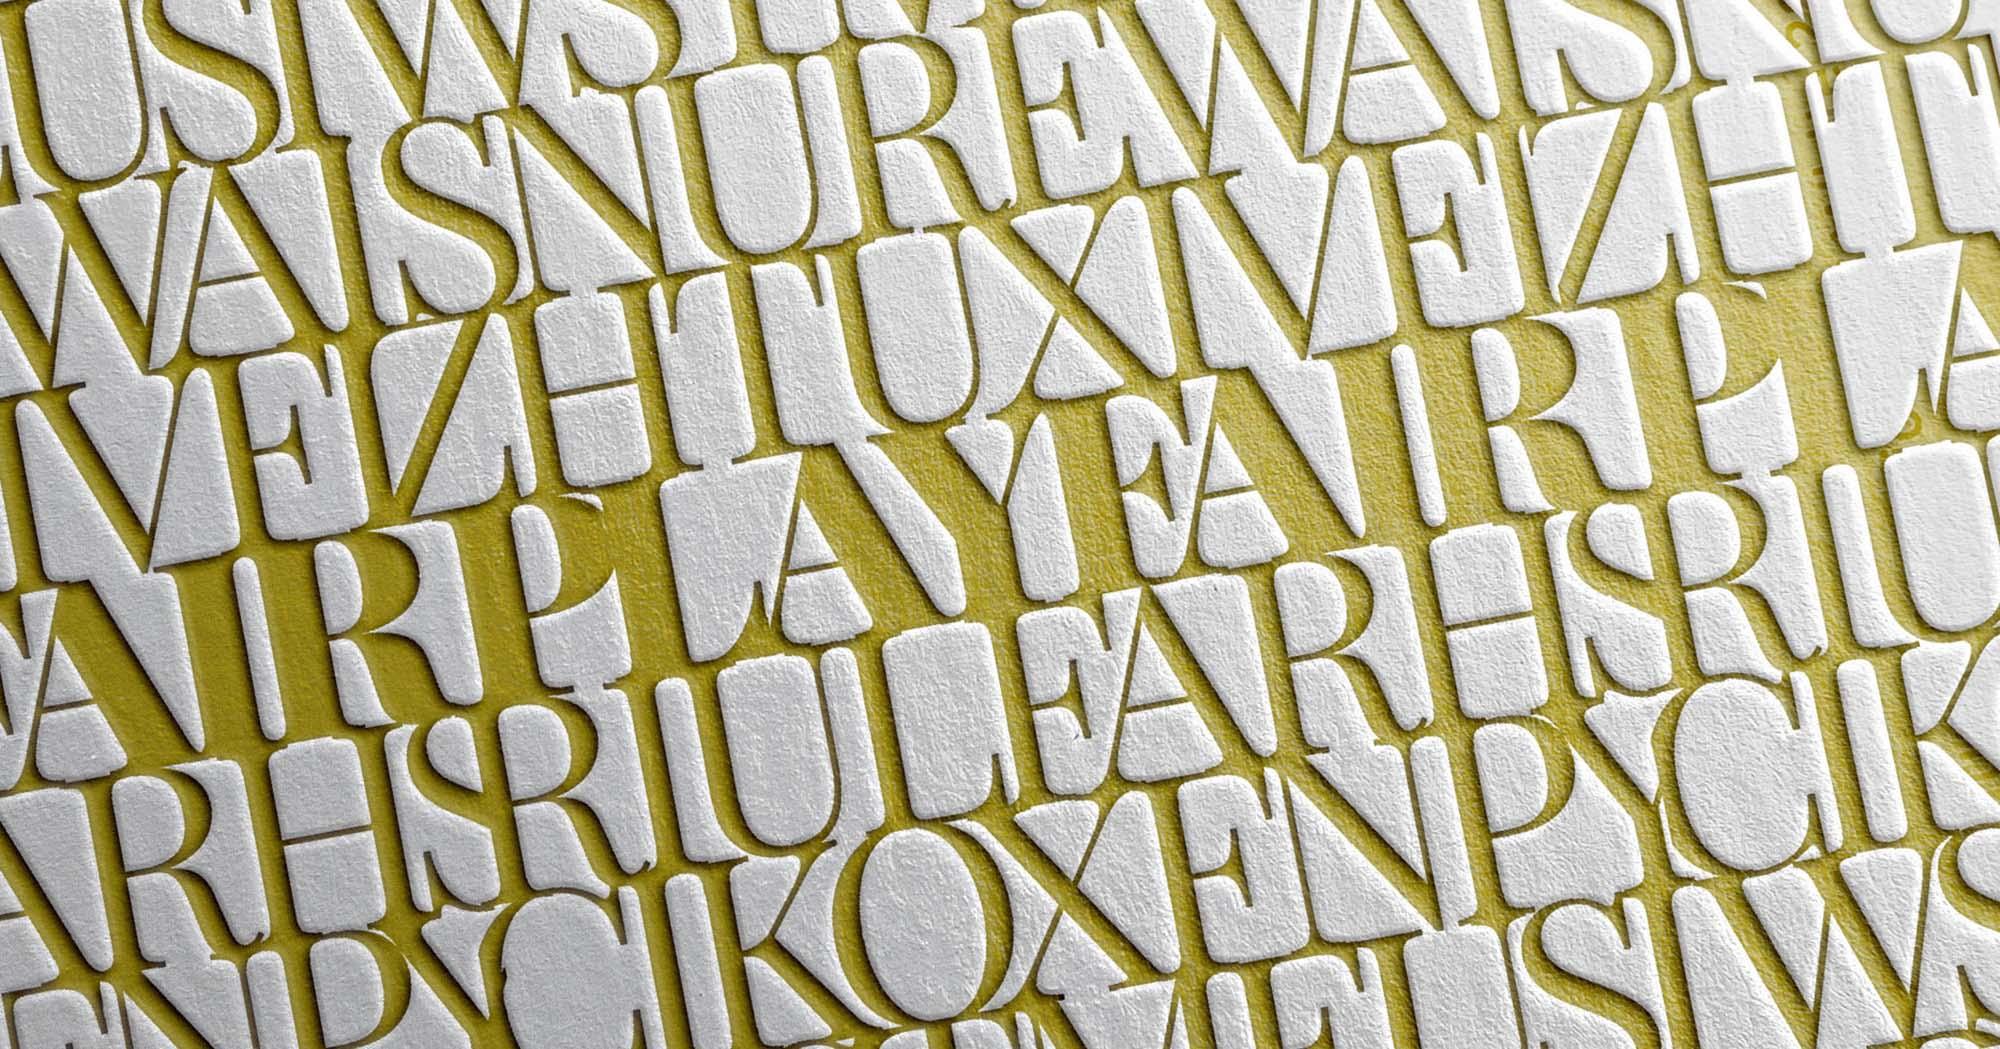 Playfair Display Font 3